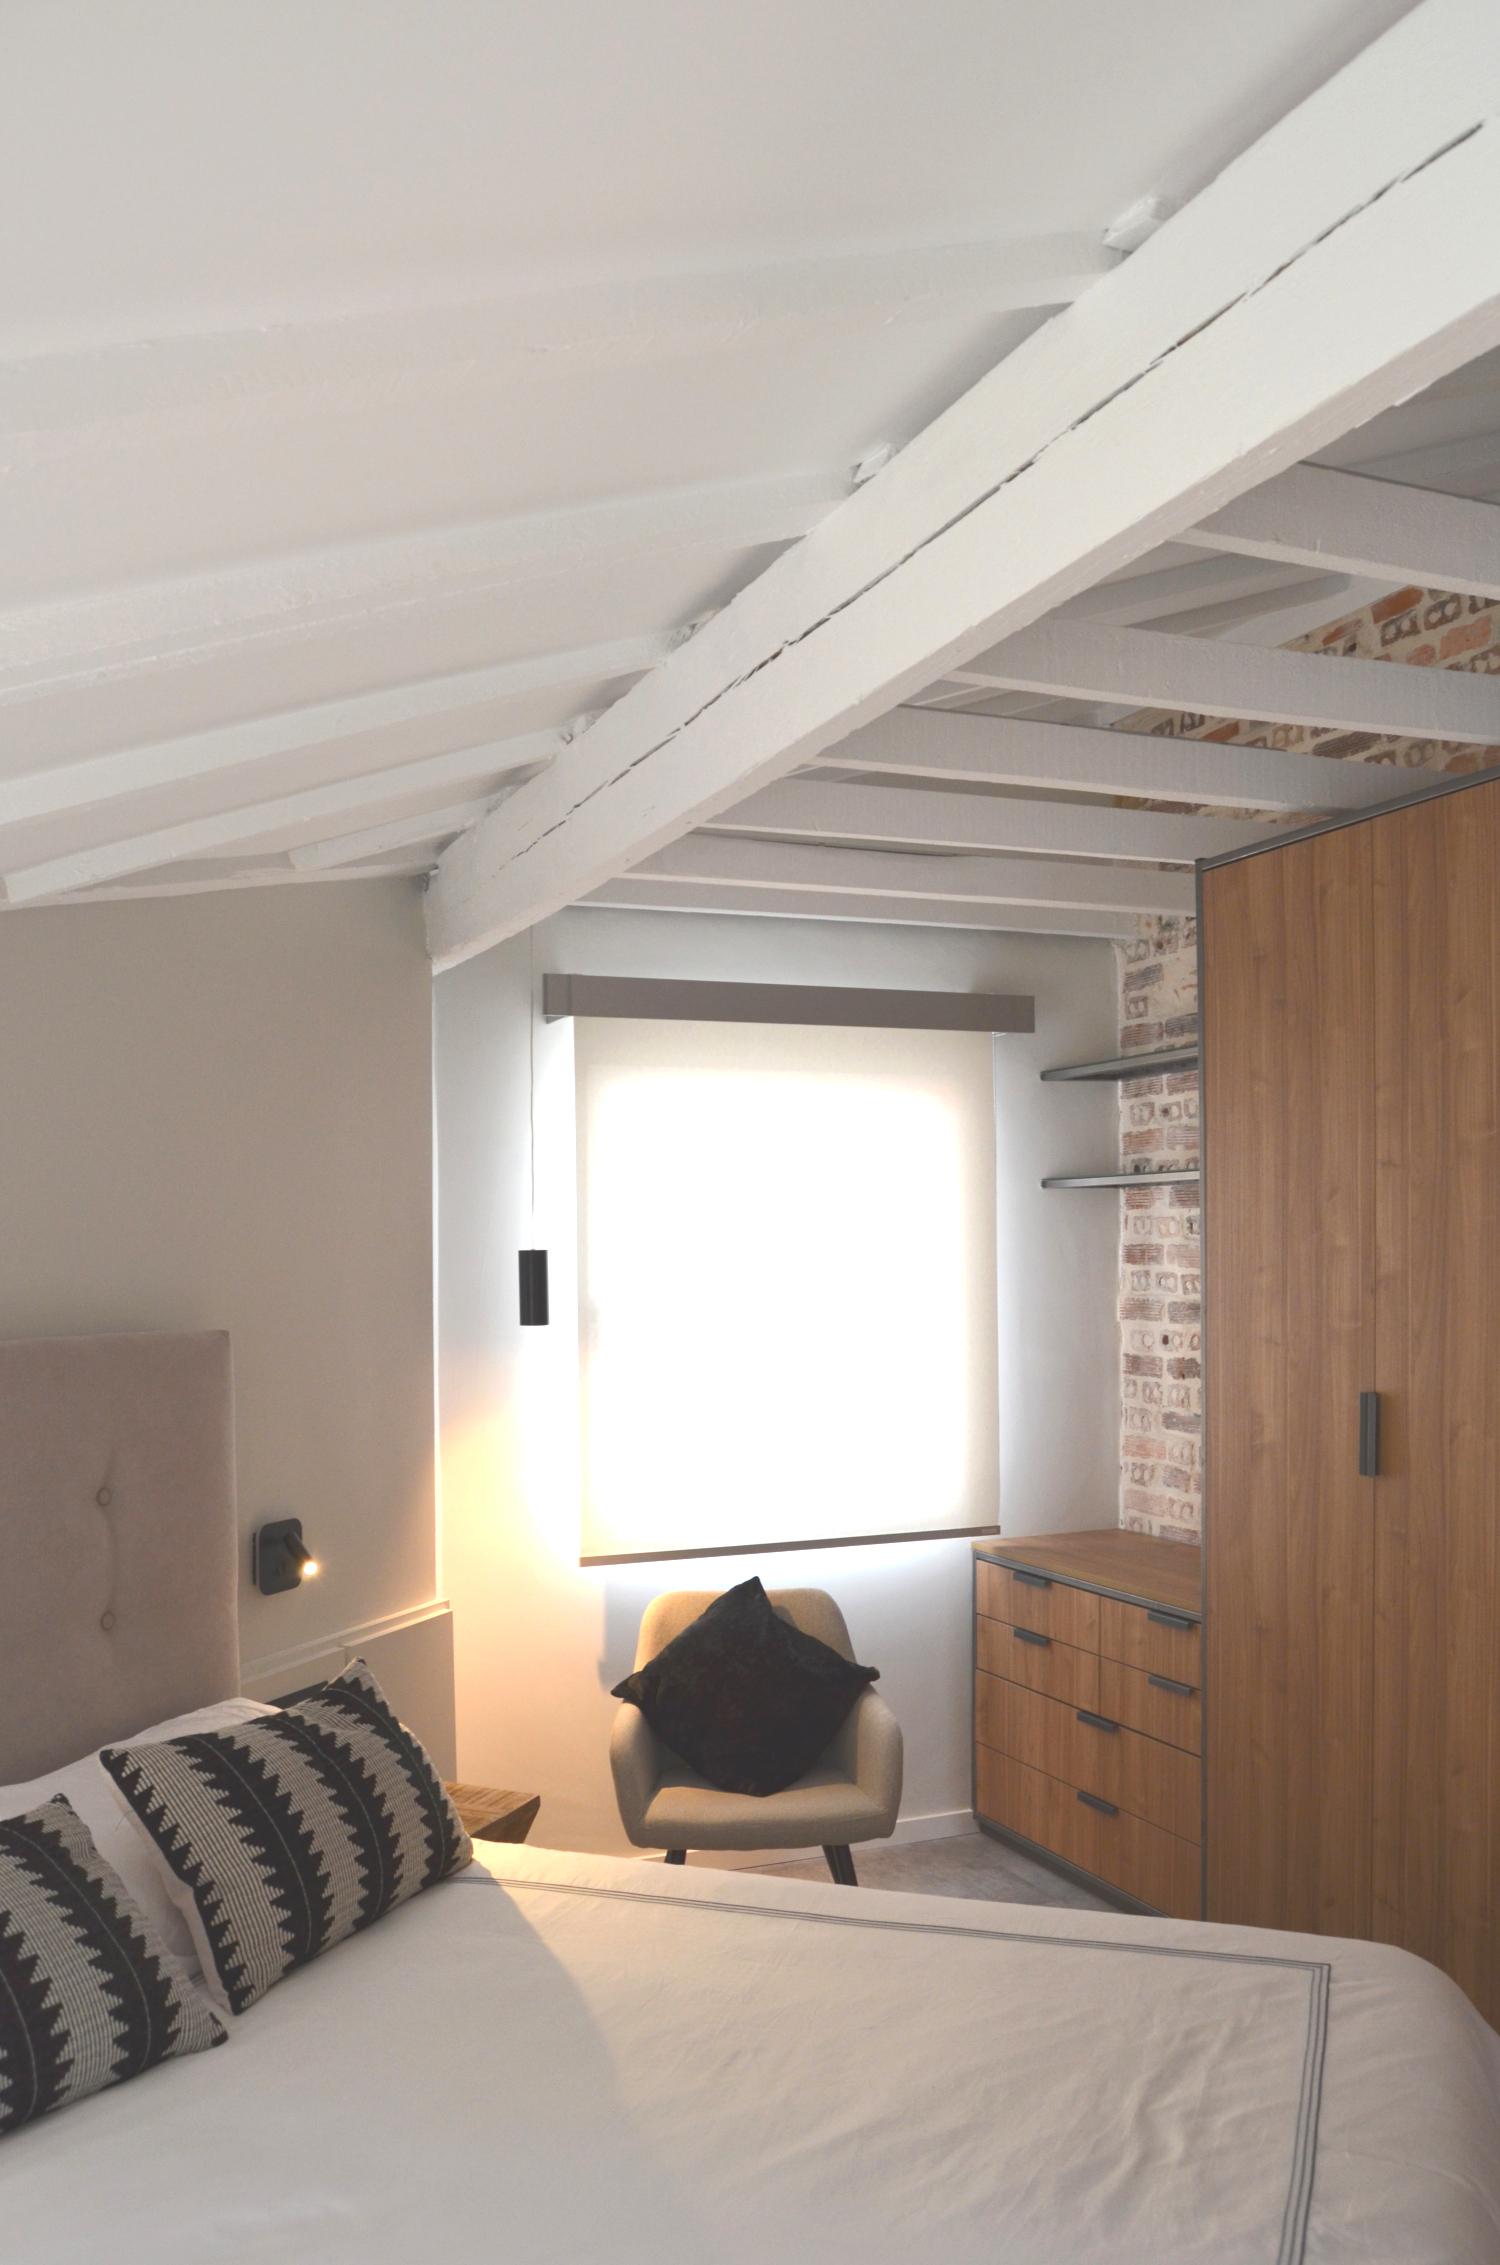 05 dormitorio (6)_